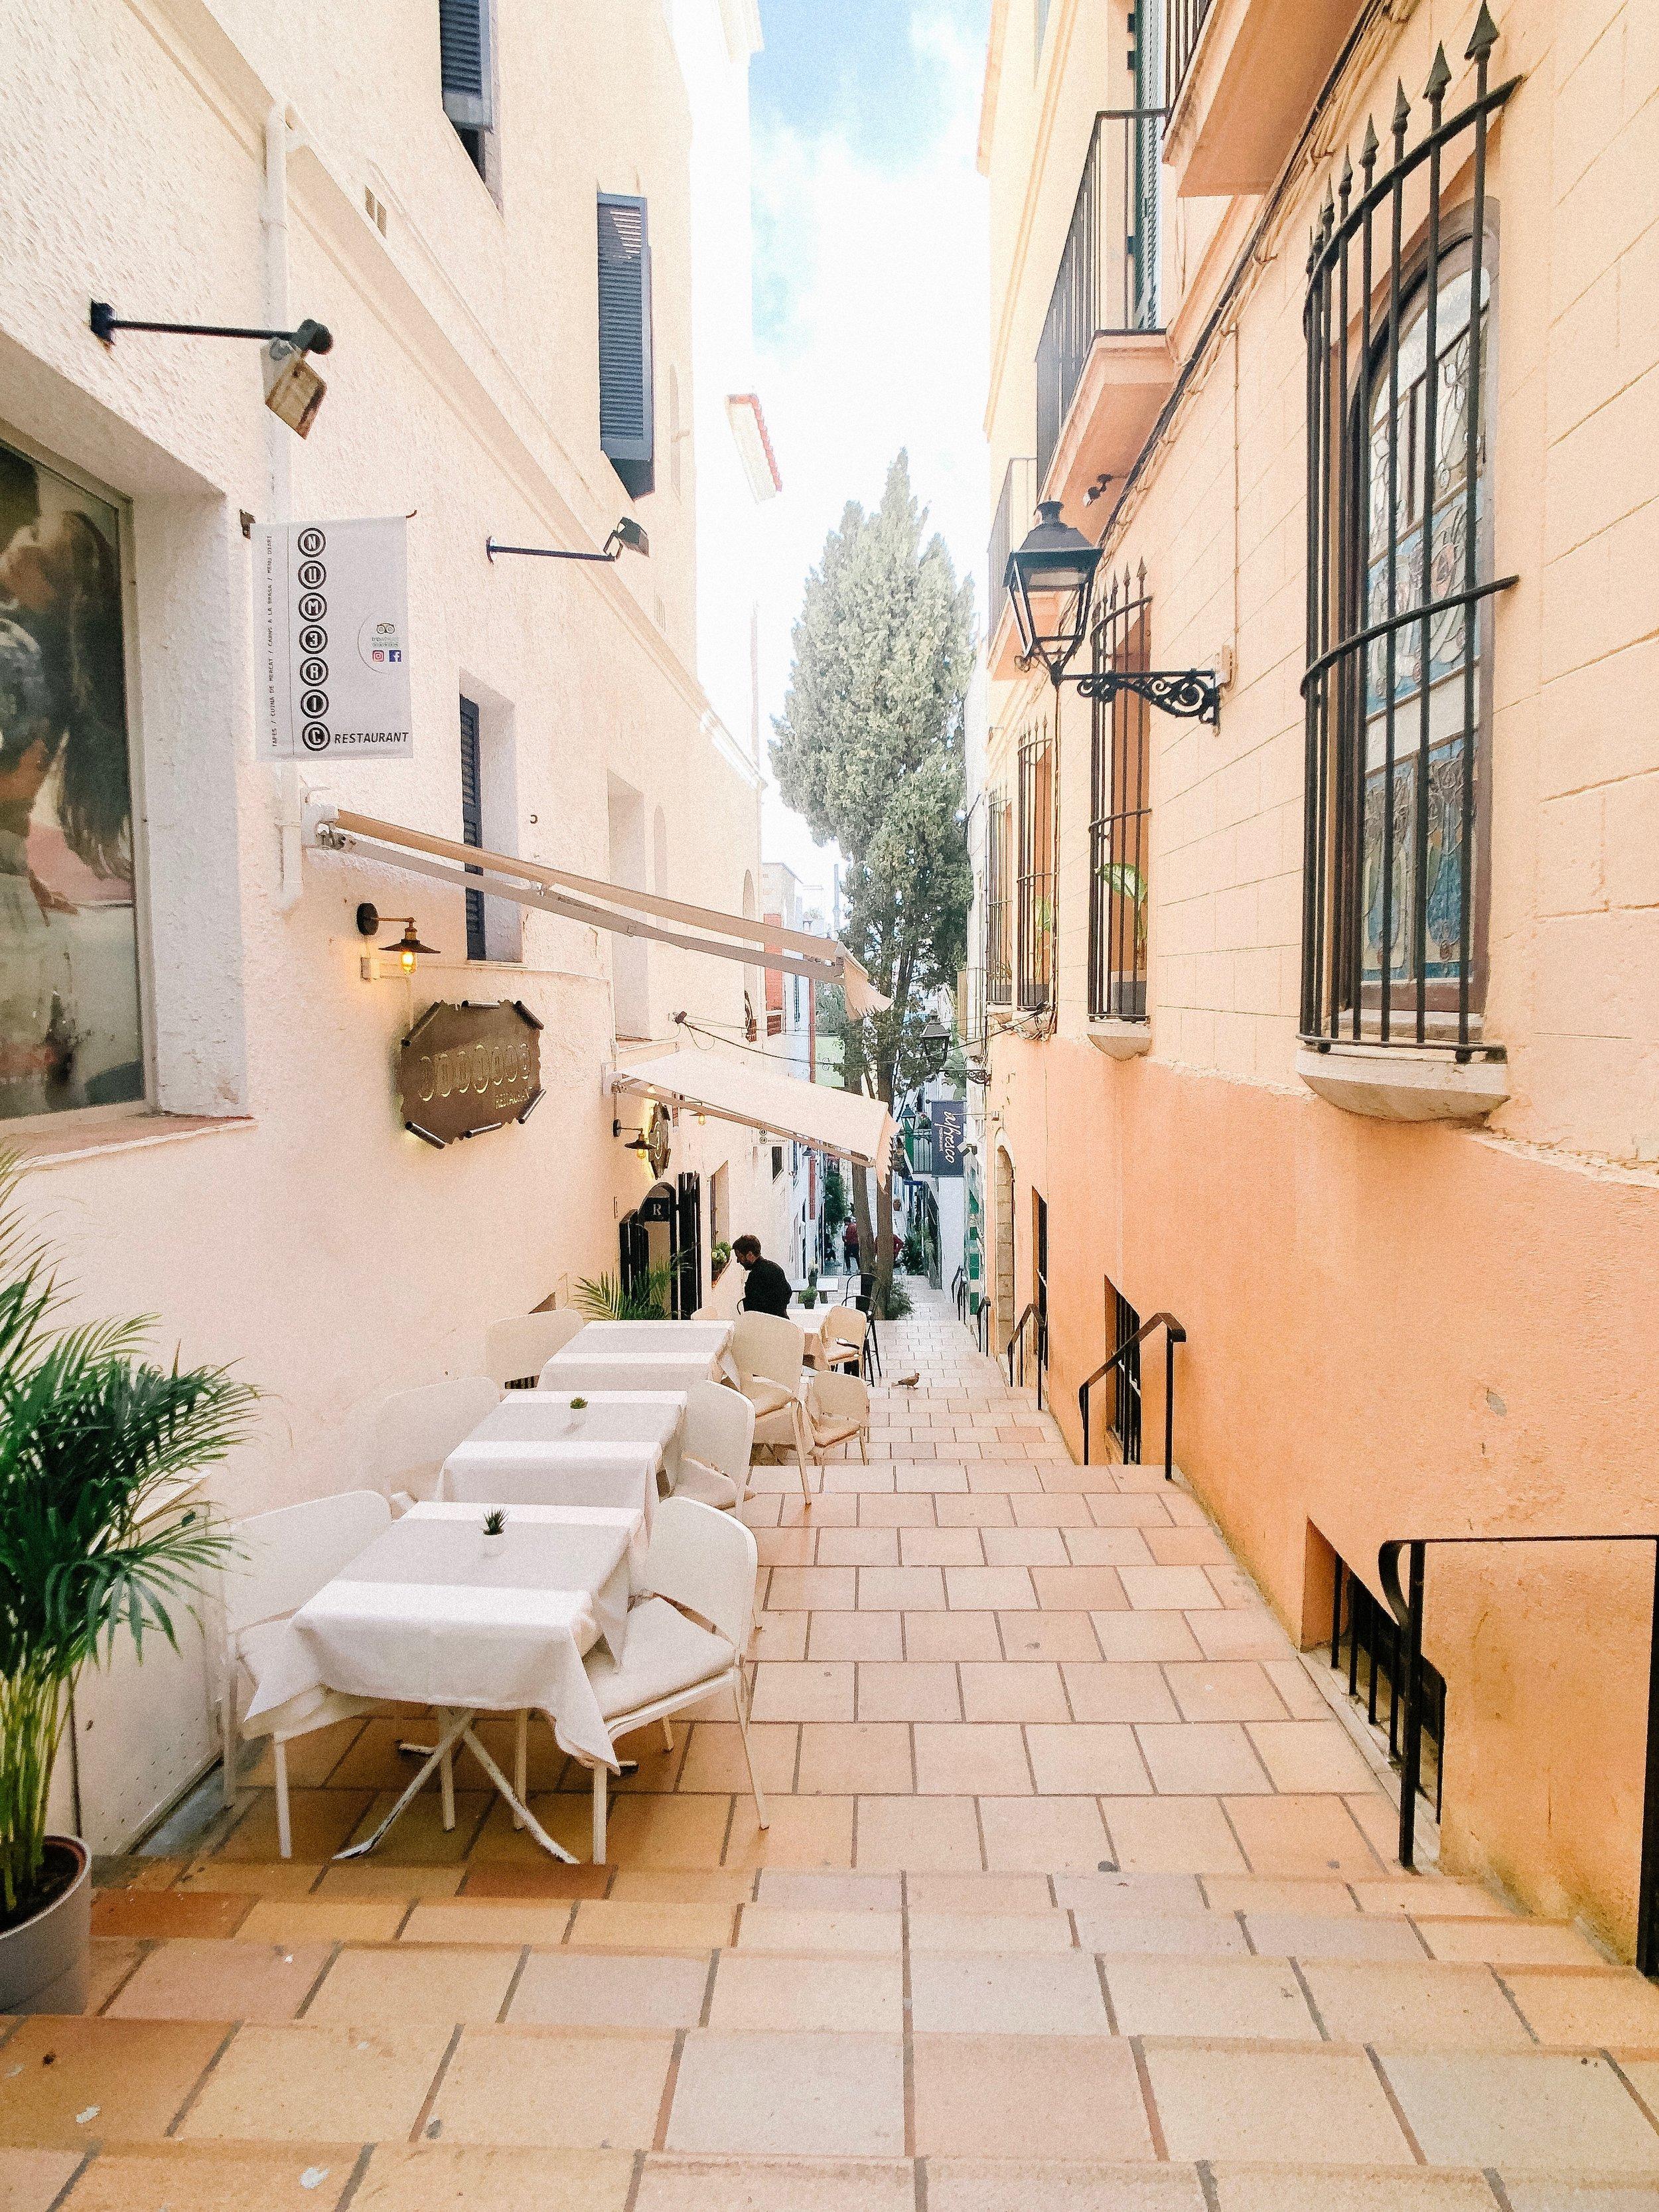 barcelona_honeymoon_sitges.jpg